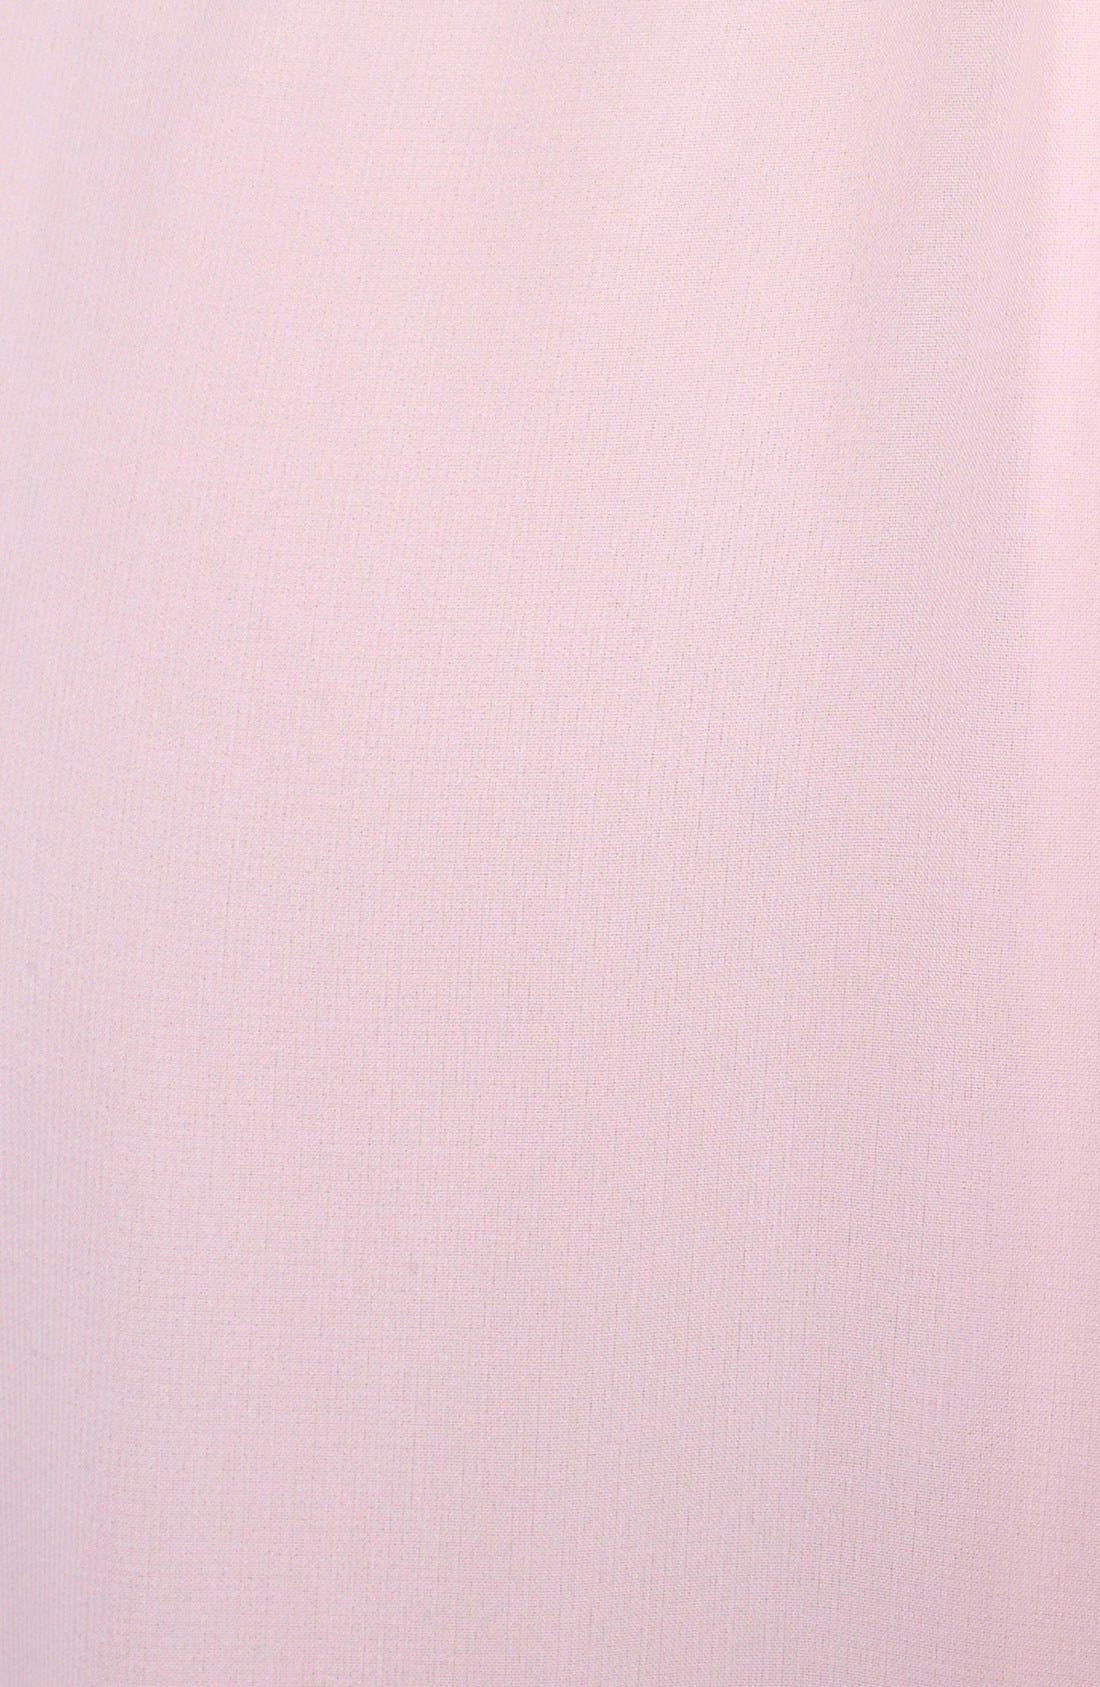 'Jordan' Open Back Chiffon Halter Gown,                             Alternate thumbnail 4, color,                             902